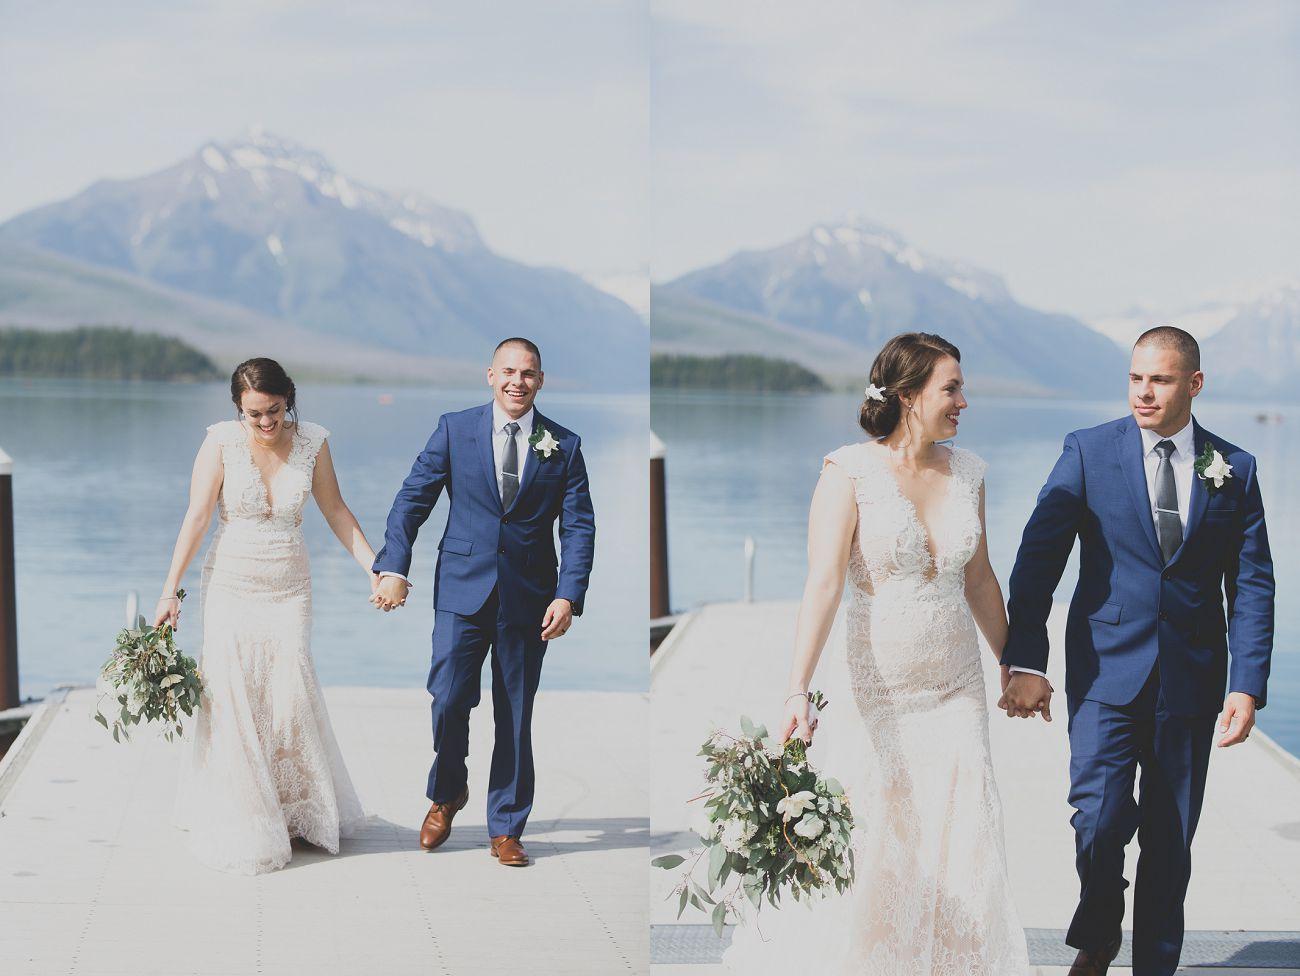 Jennifer_Mooney_Photo_Glacier_Park_Weddings_Elopement_00065.jpg